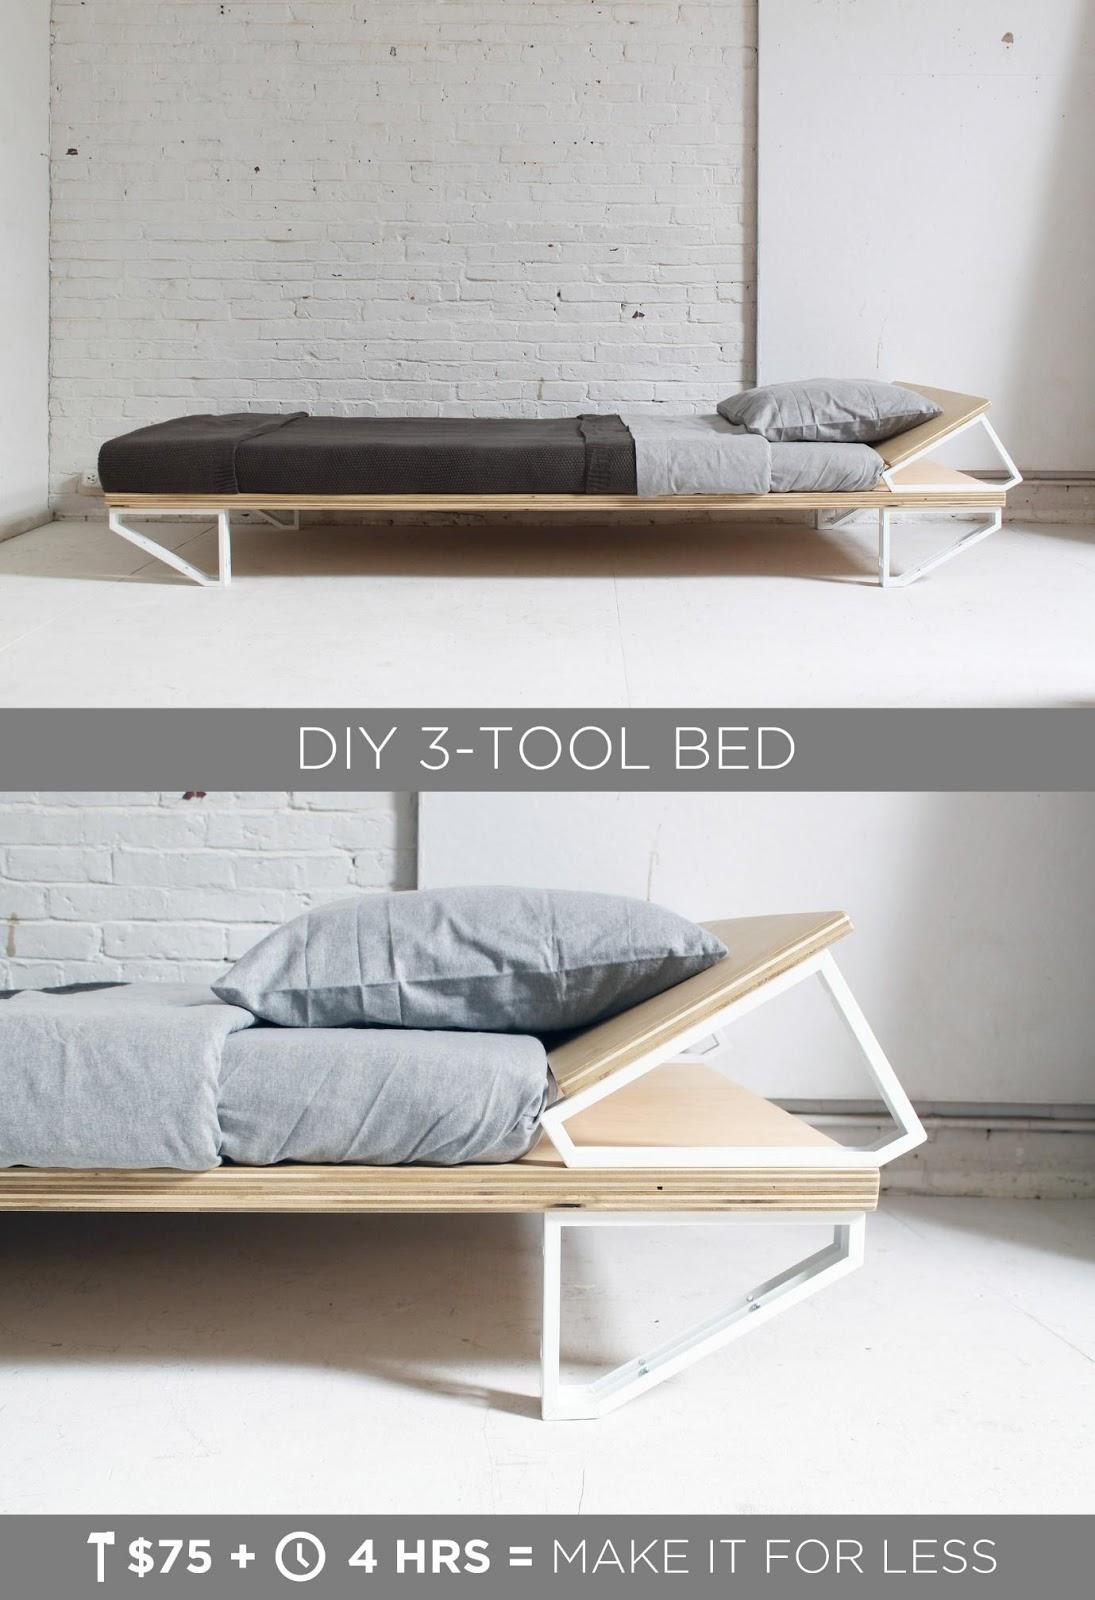 2.DIY 3 Tool bed by simphome.com